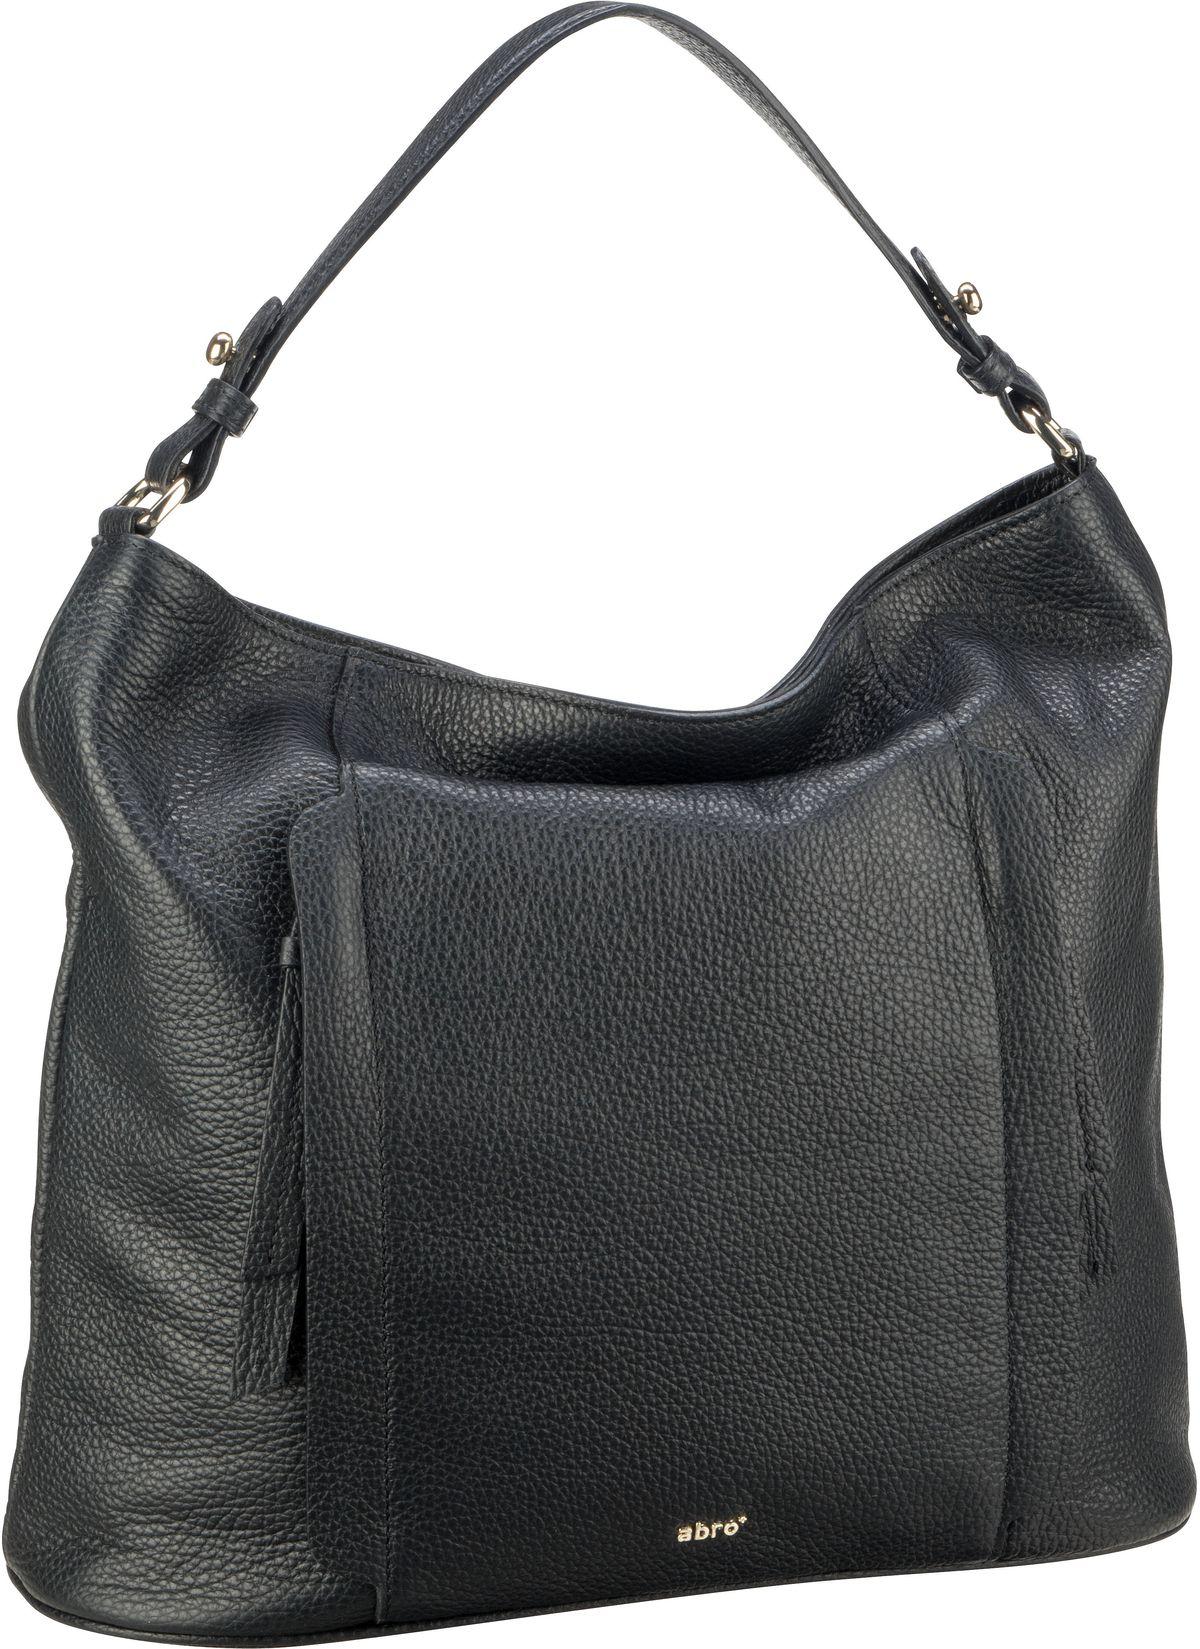 Handtasche Calf Adria 28628 Black